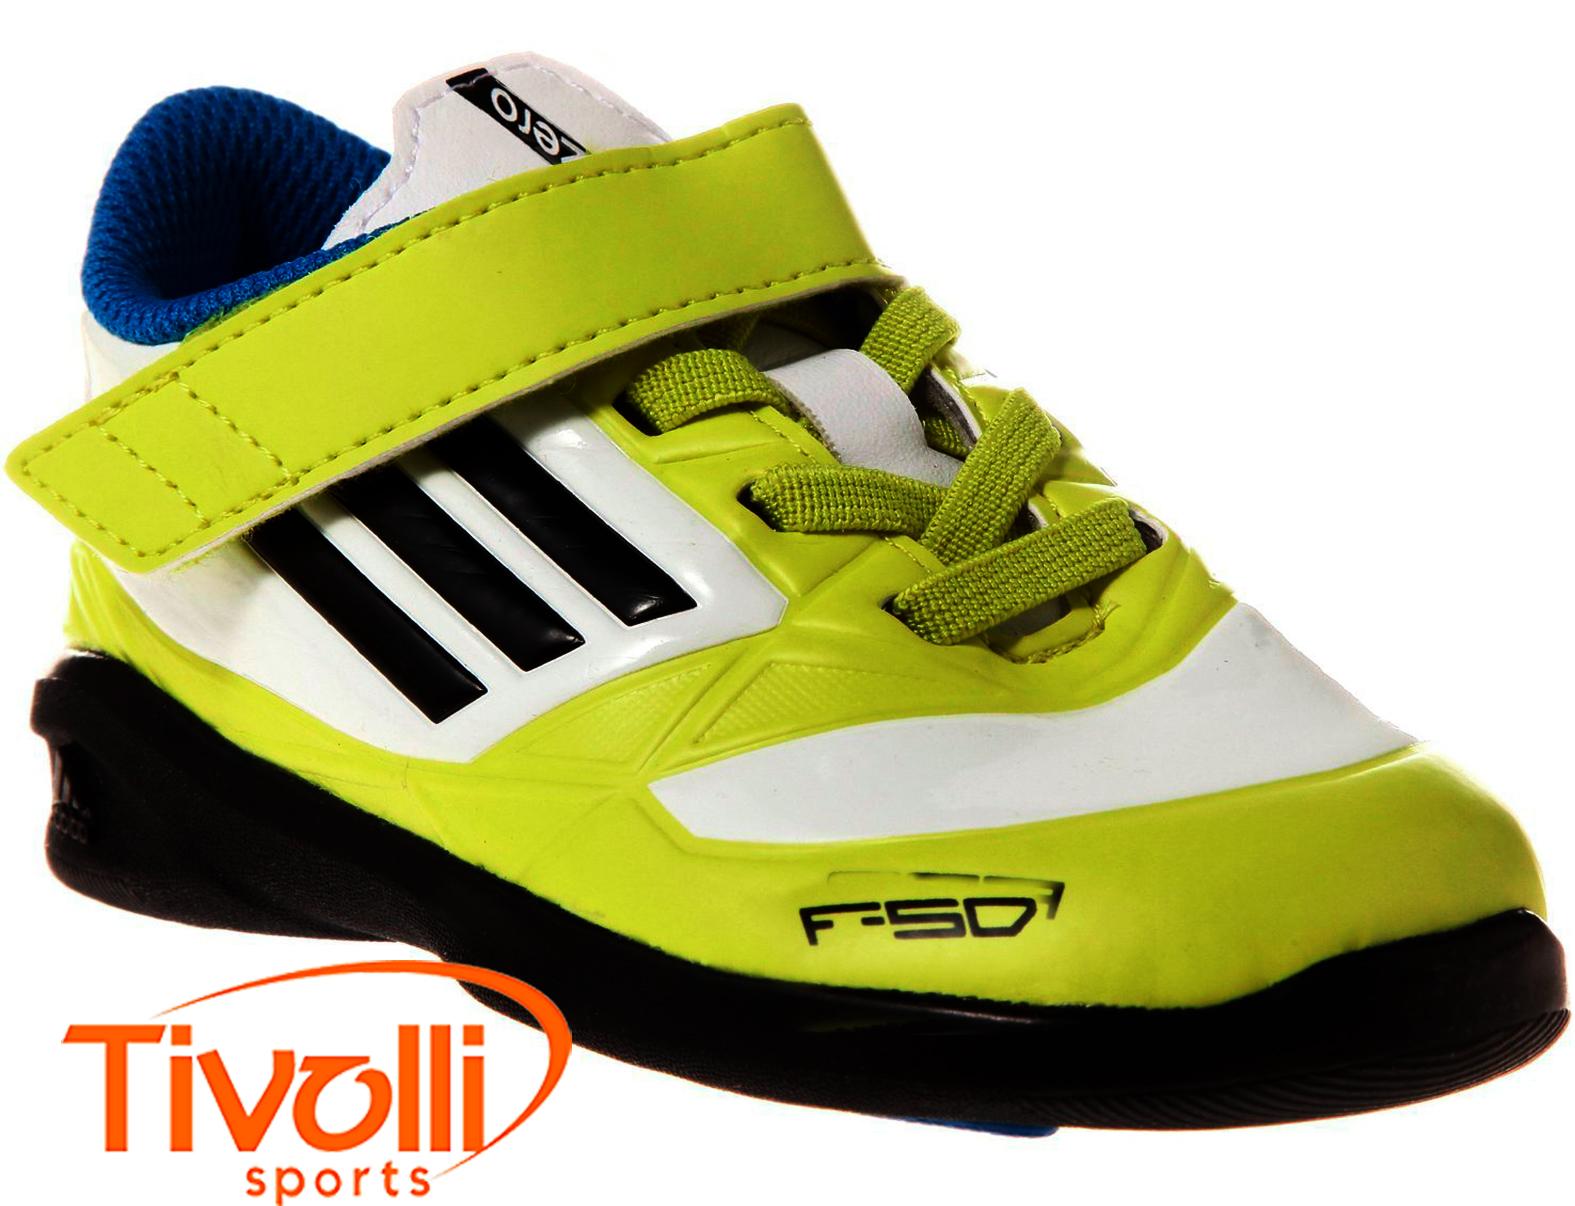 96ae1ce0fe Chuteira Adidas Kids F50 Adizero CF Infantil